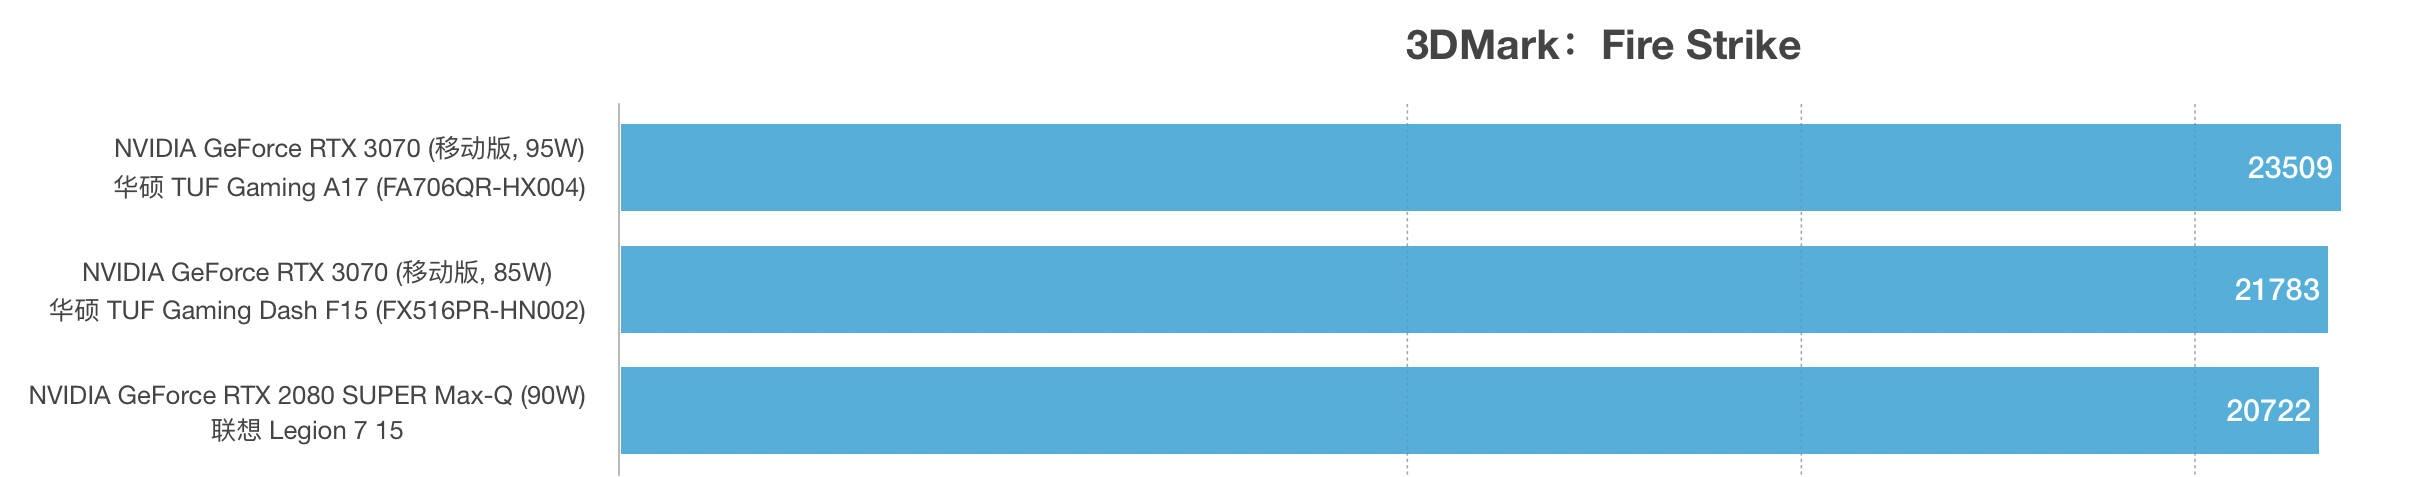 RTX 3070和RTX 2080 SUPER Max-Q性能跑分对比评测